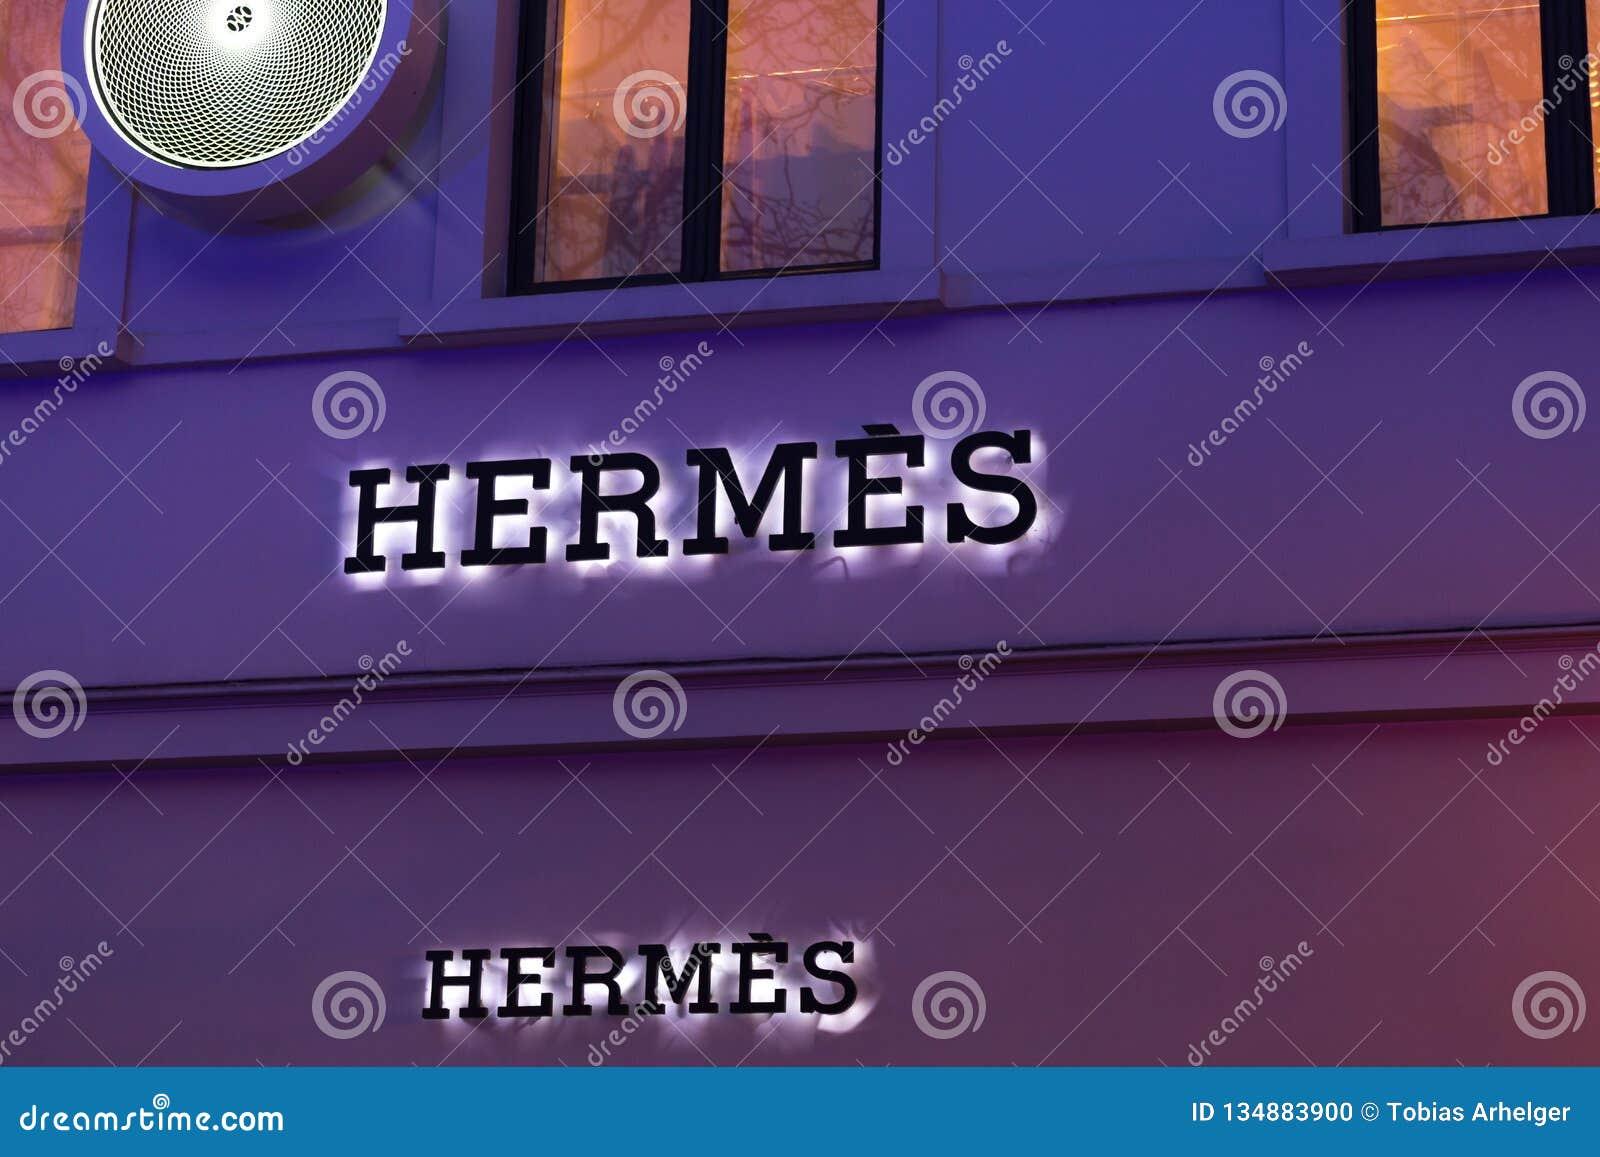 Brussels, brussels/belgium - 13 12 18: Hermès store sign in brussels belgium